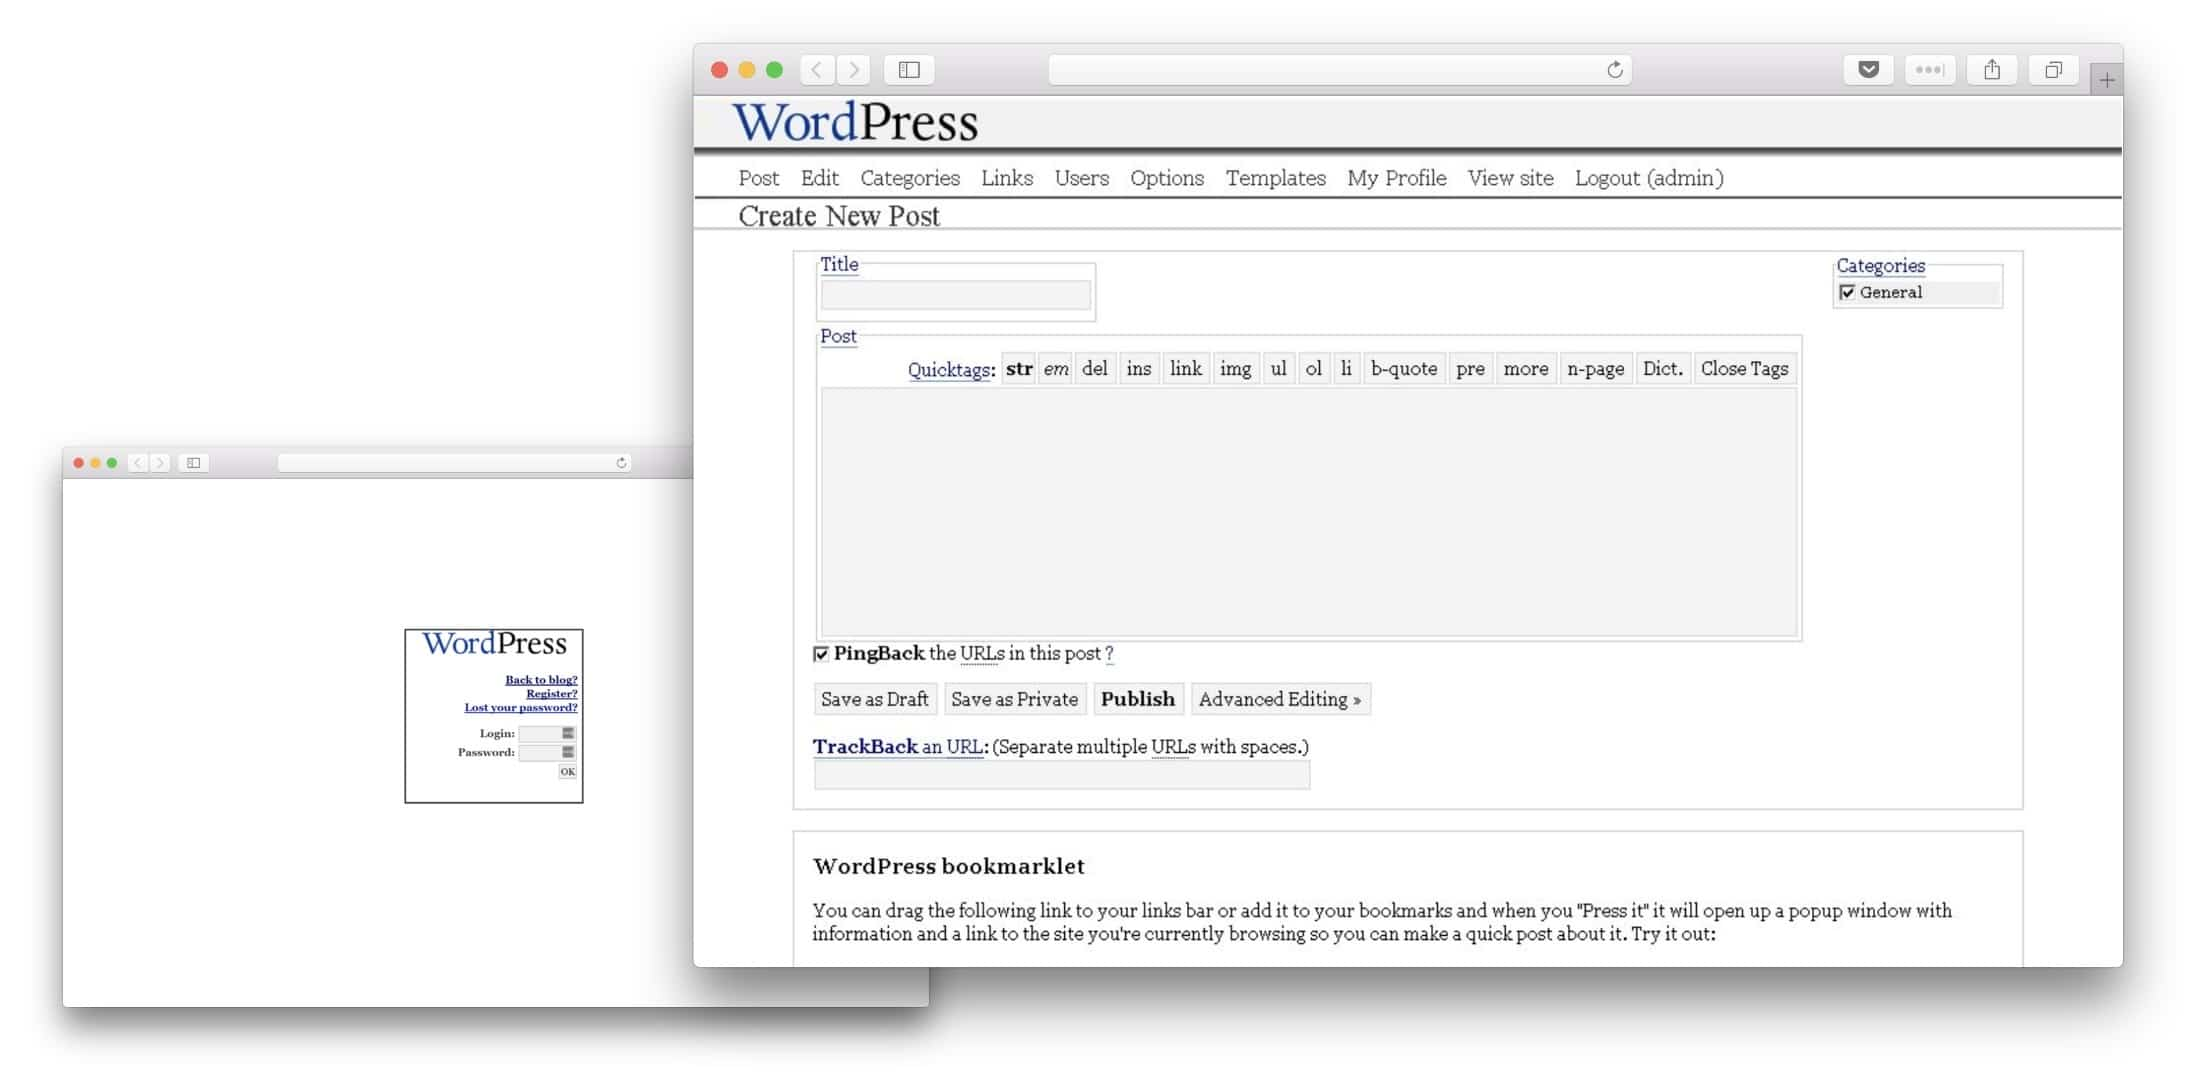 WordPress 1.0 UI